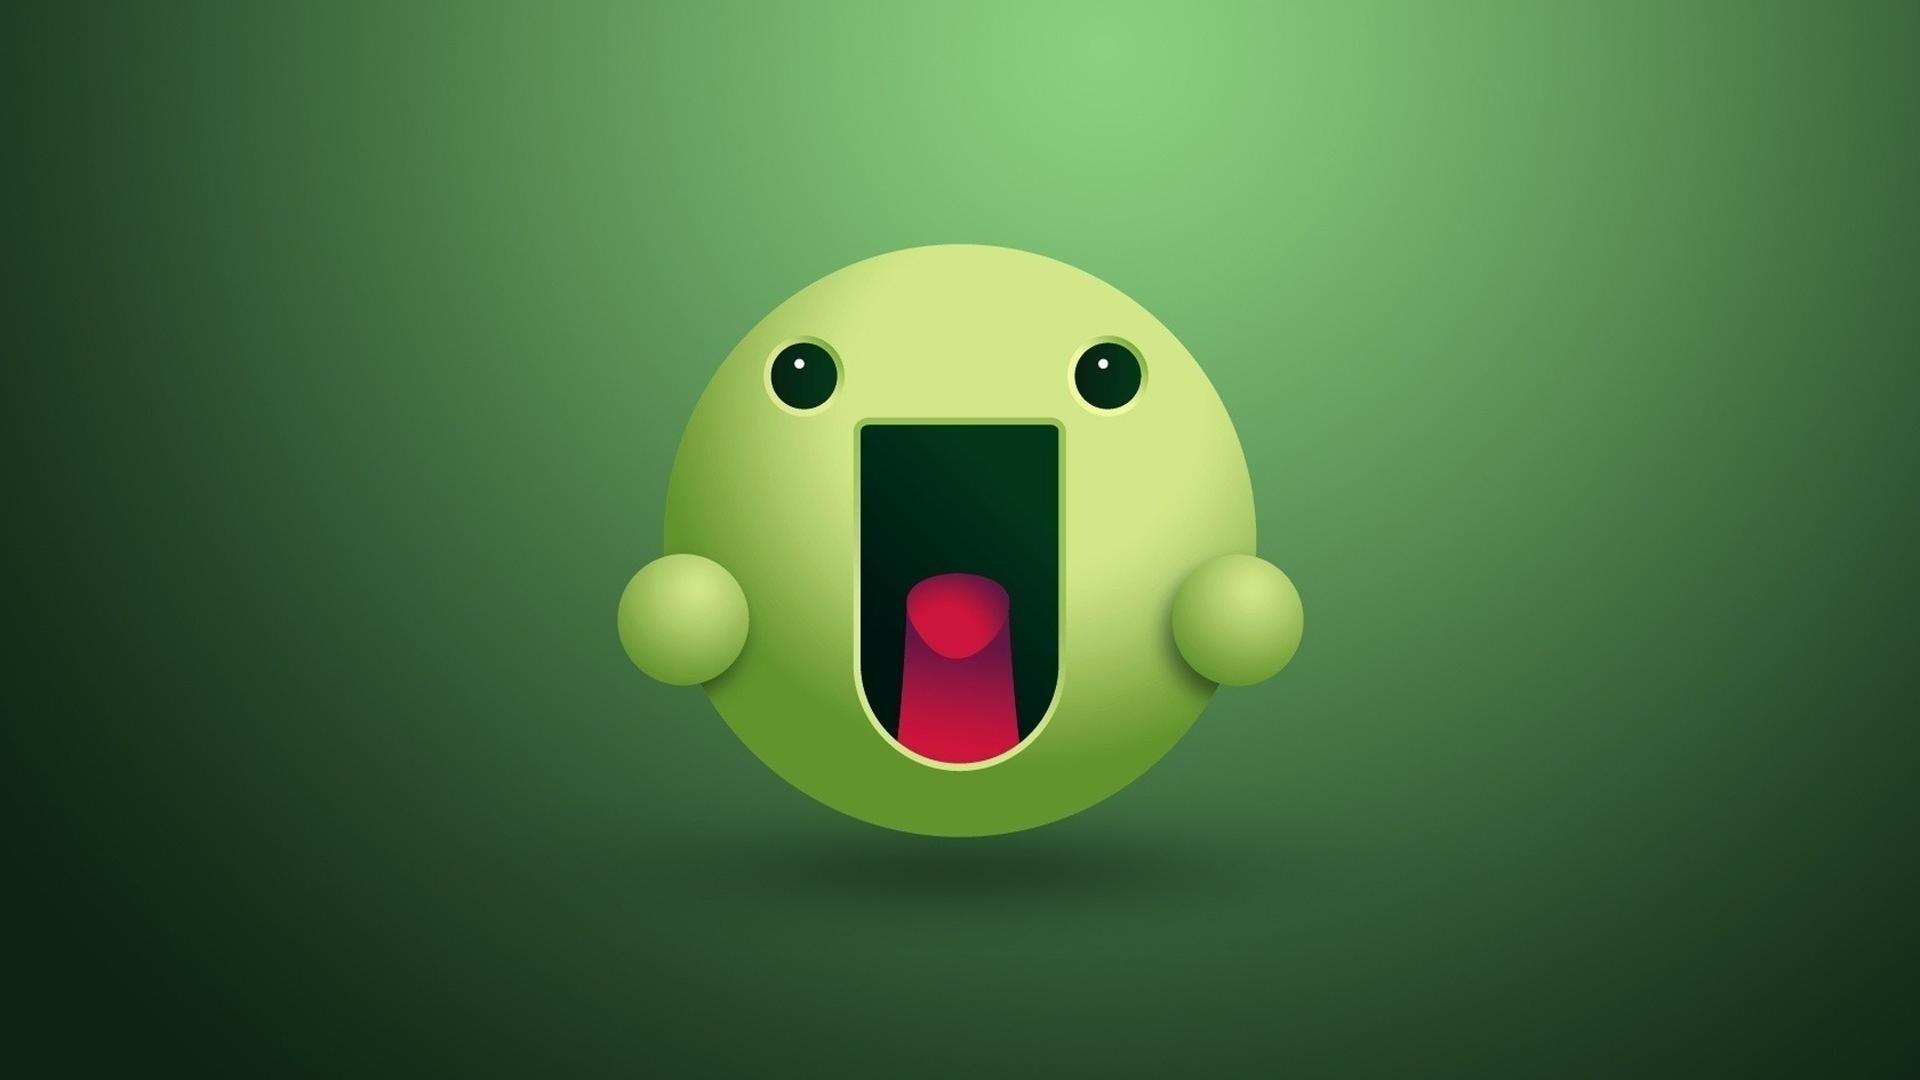 Smiley Face Backgrounds: Smiley Faces Desktop Background ·①